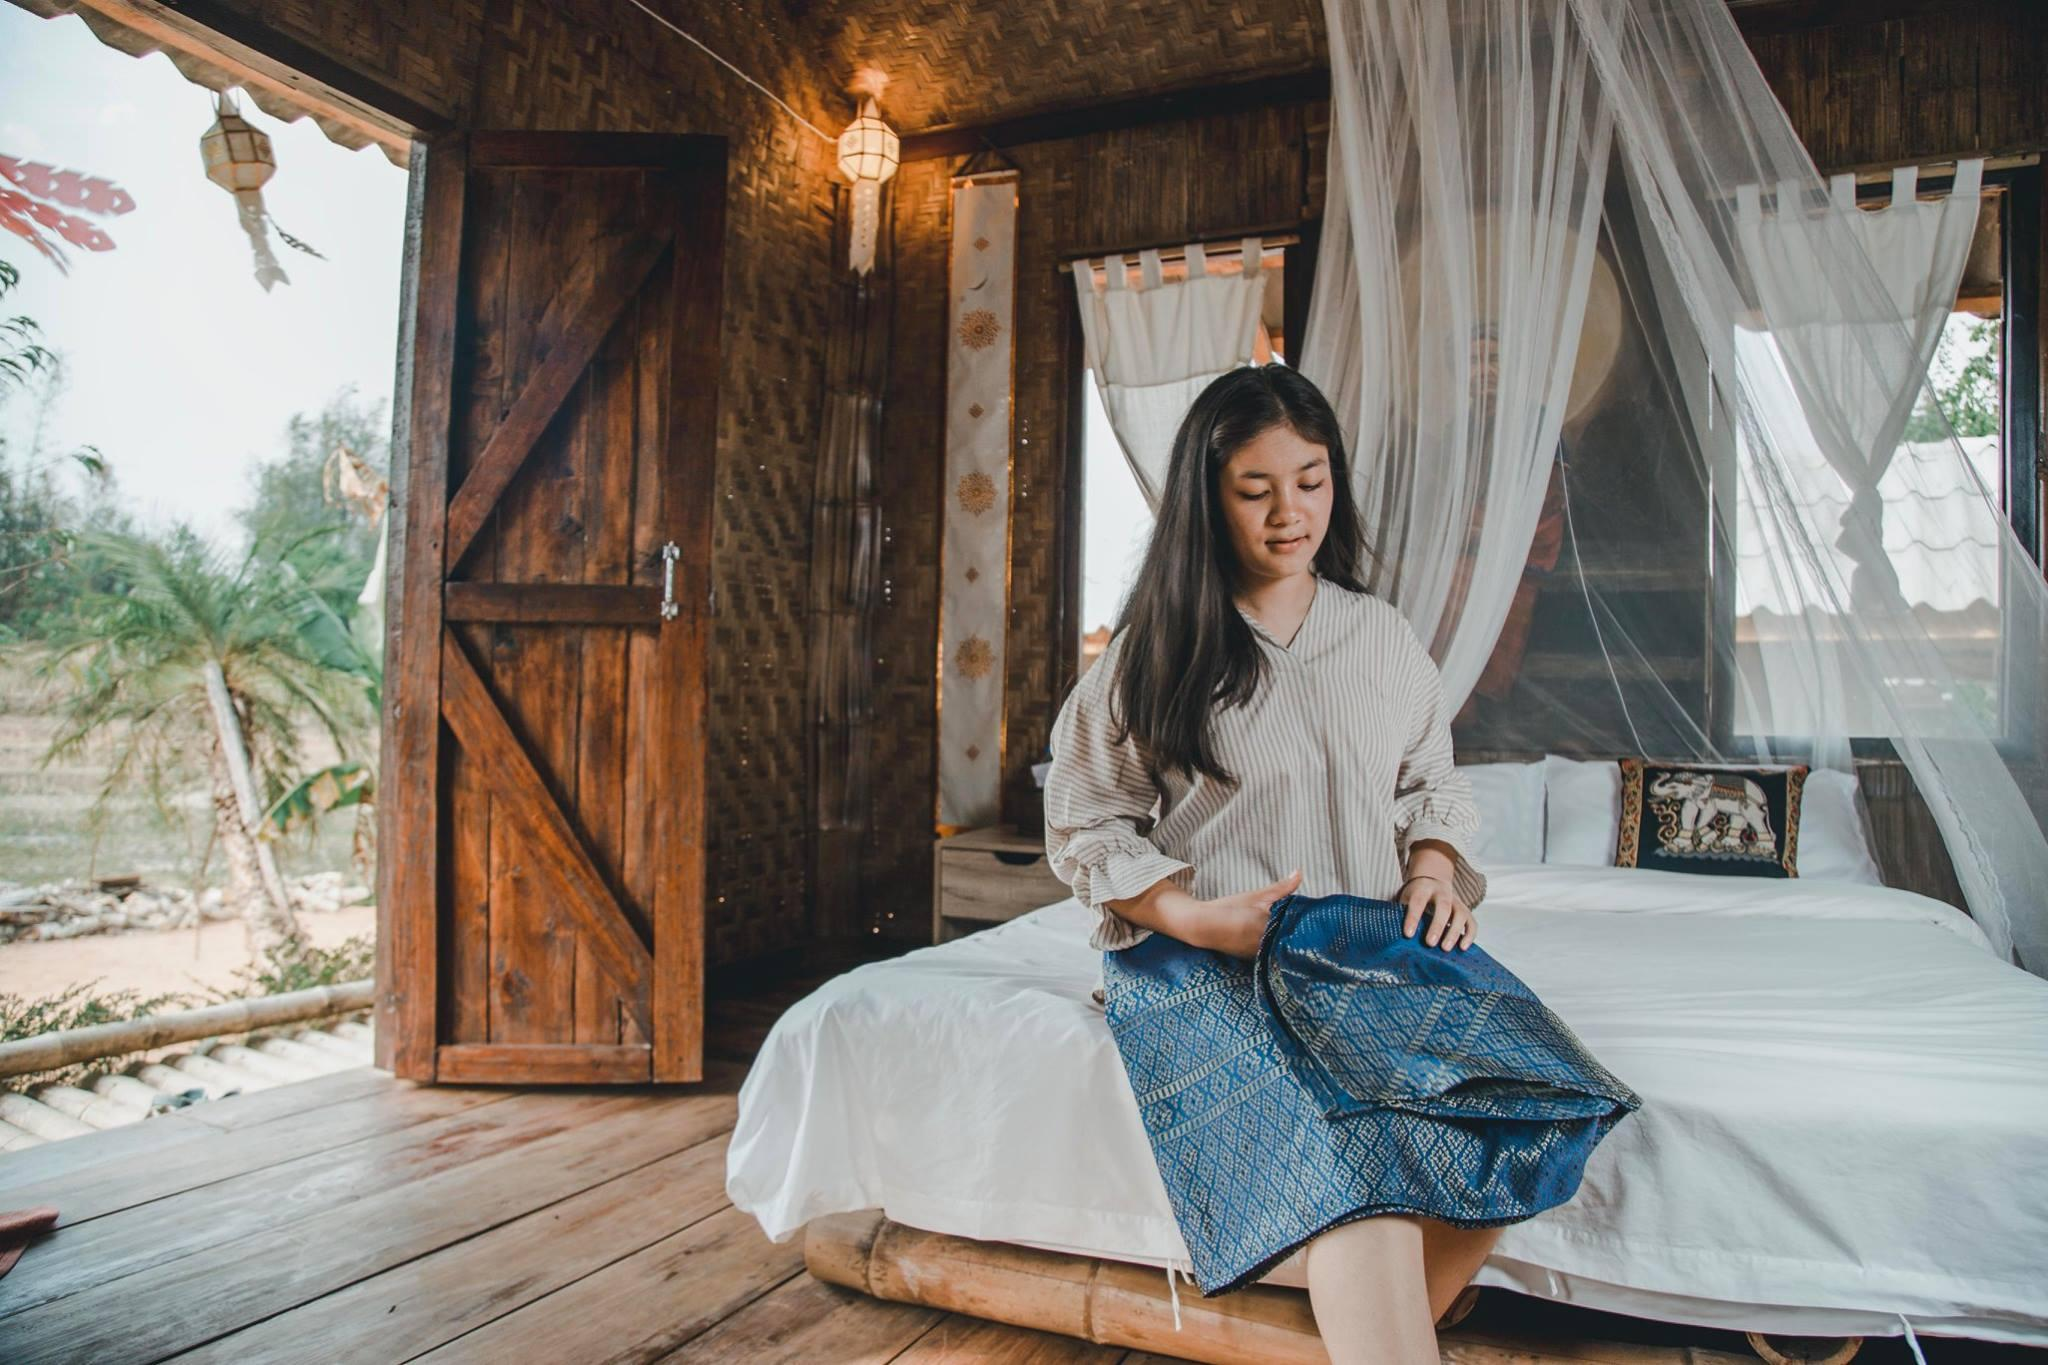 nongtao village home stay บังกะโล 1 ห้องนอน 1 ห้องน้ำส่วนตัว ขนาด 16 ตร.ม. – สุเทพ